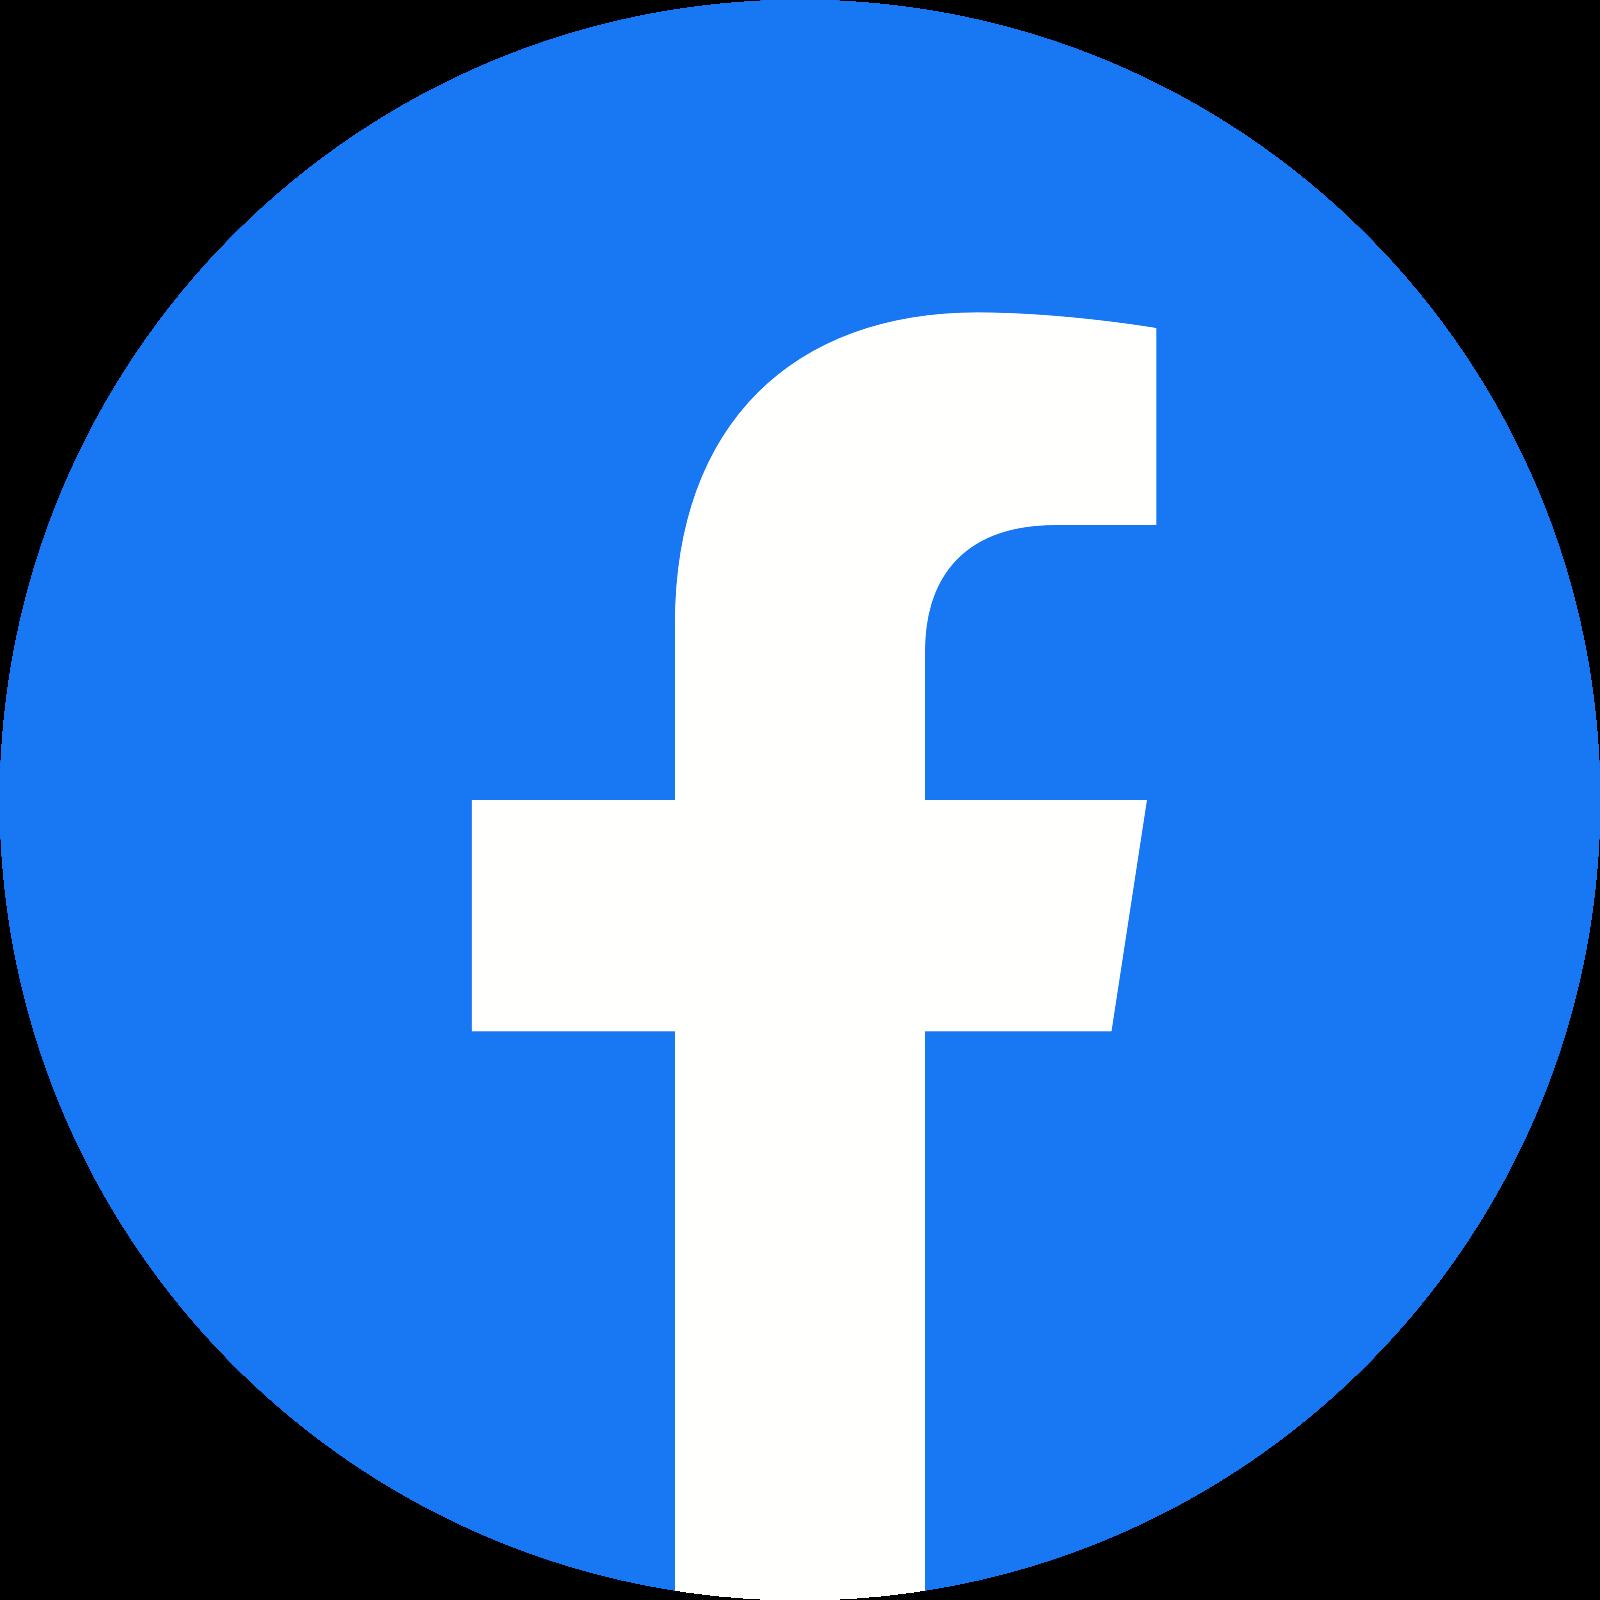 New Facebook Logo 2019 PNG Transparent & SVG Vector.